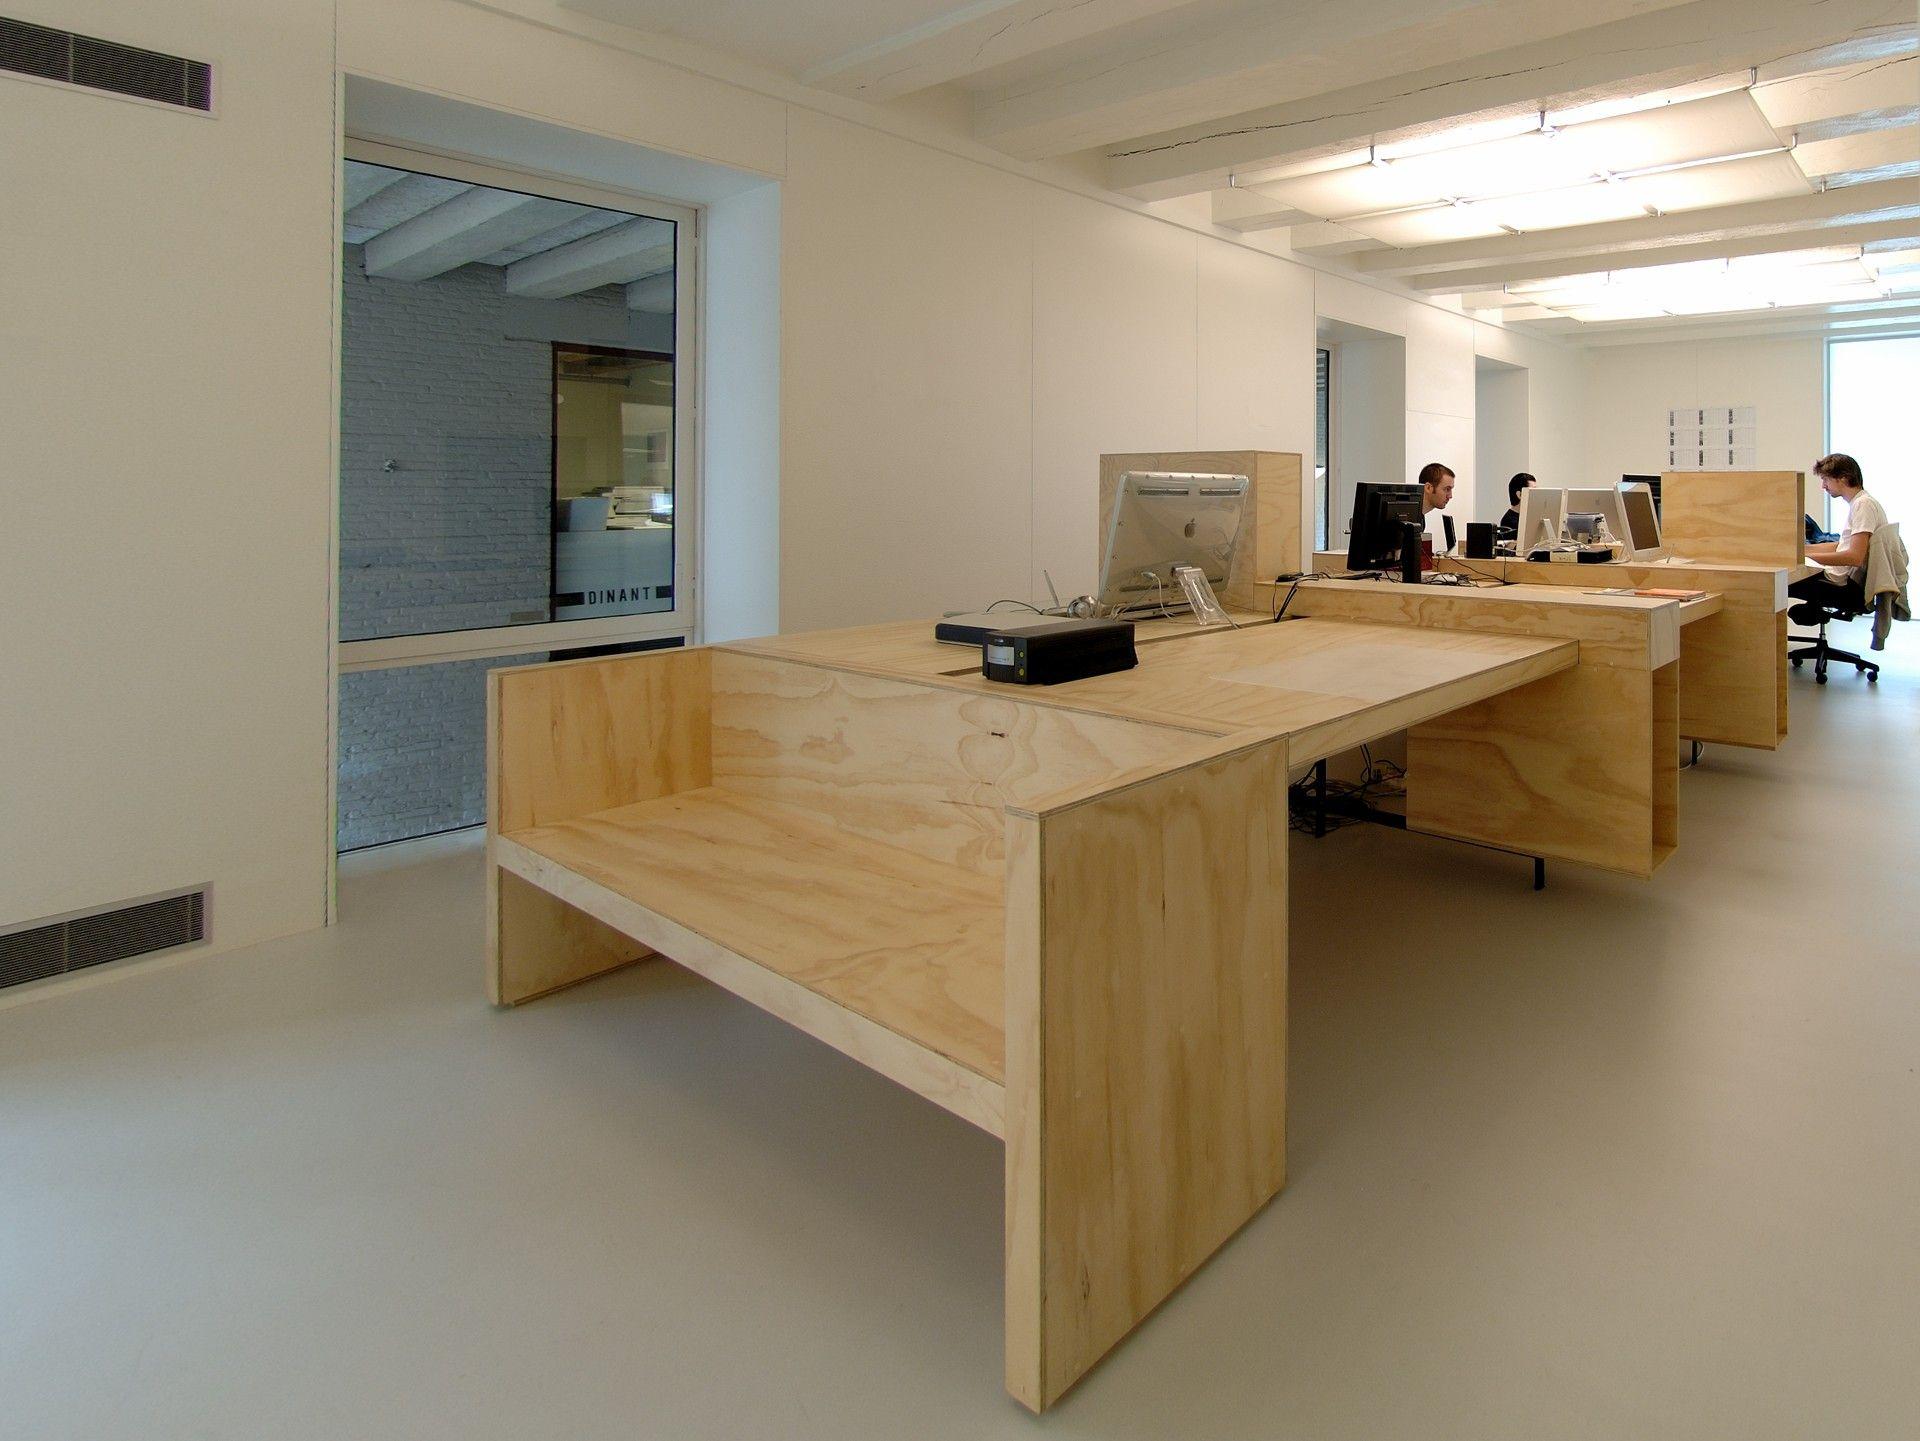 Kantoorinrichting Van Hypernuit : I29 interior architects office 01 1 5 o.s.b plywood